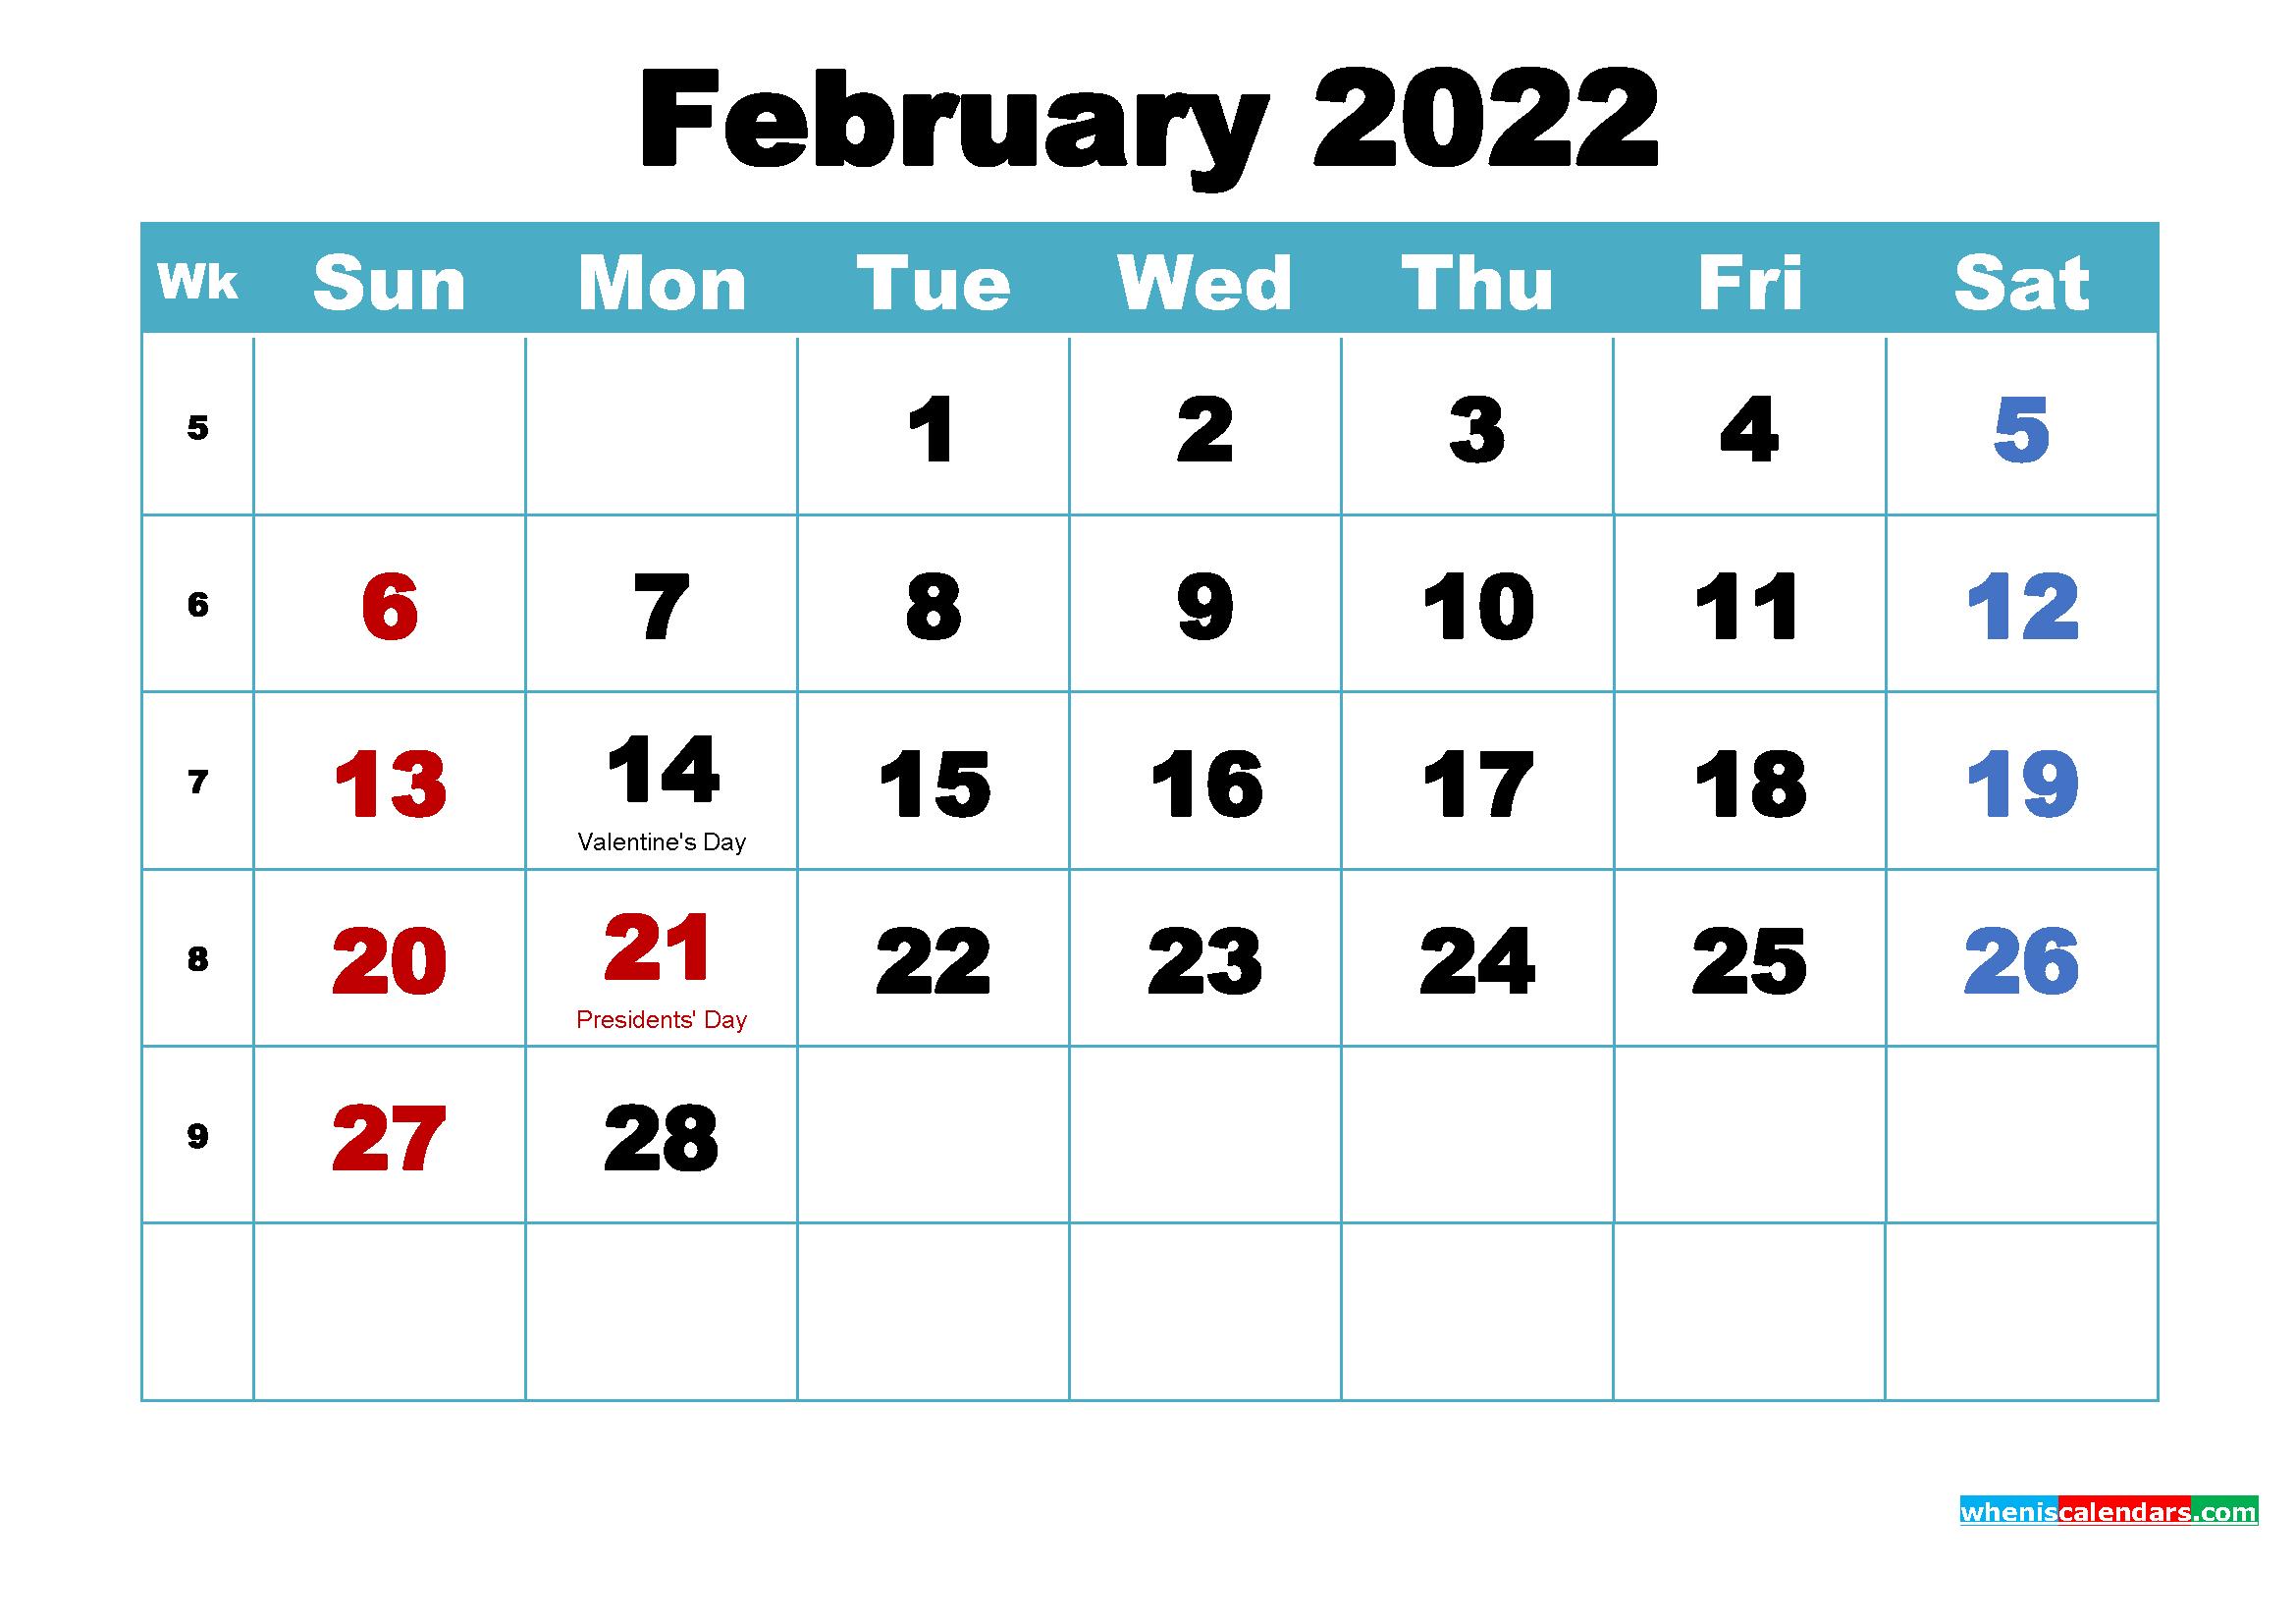 Free February 2022 Desktop Calendar High Resolution Pertaining To February 2022 Month Calendar Page